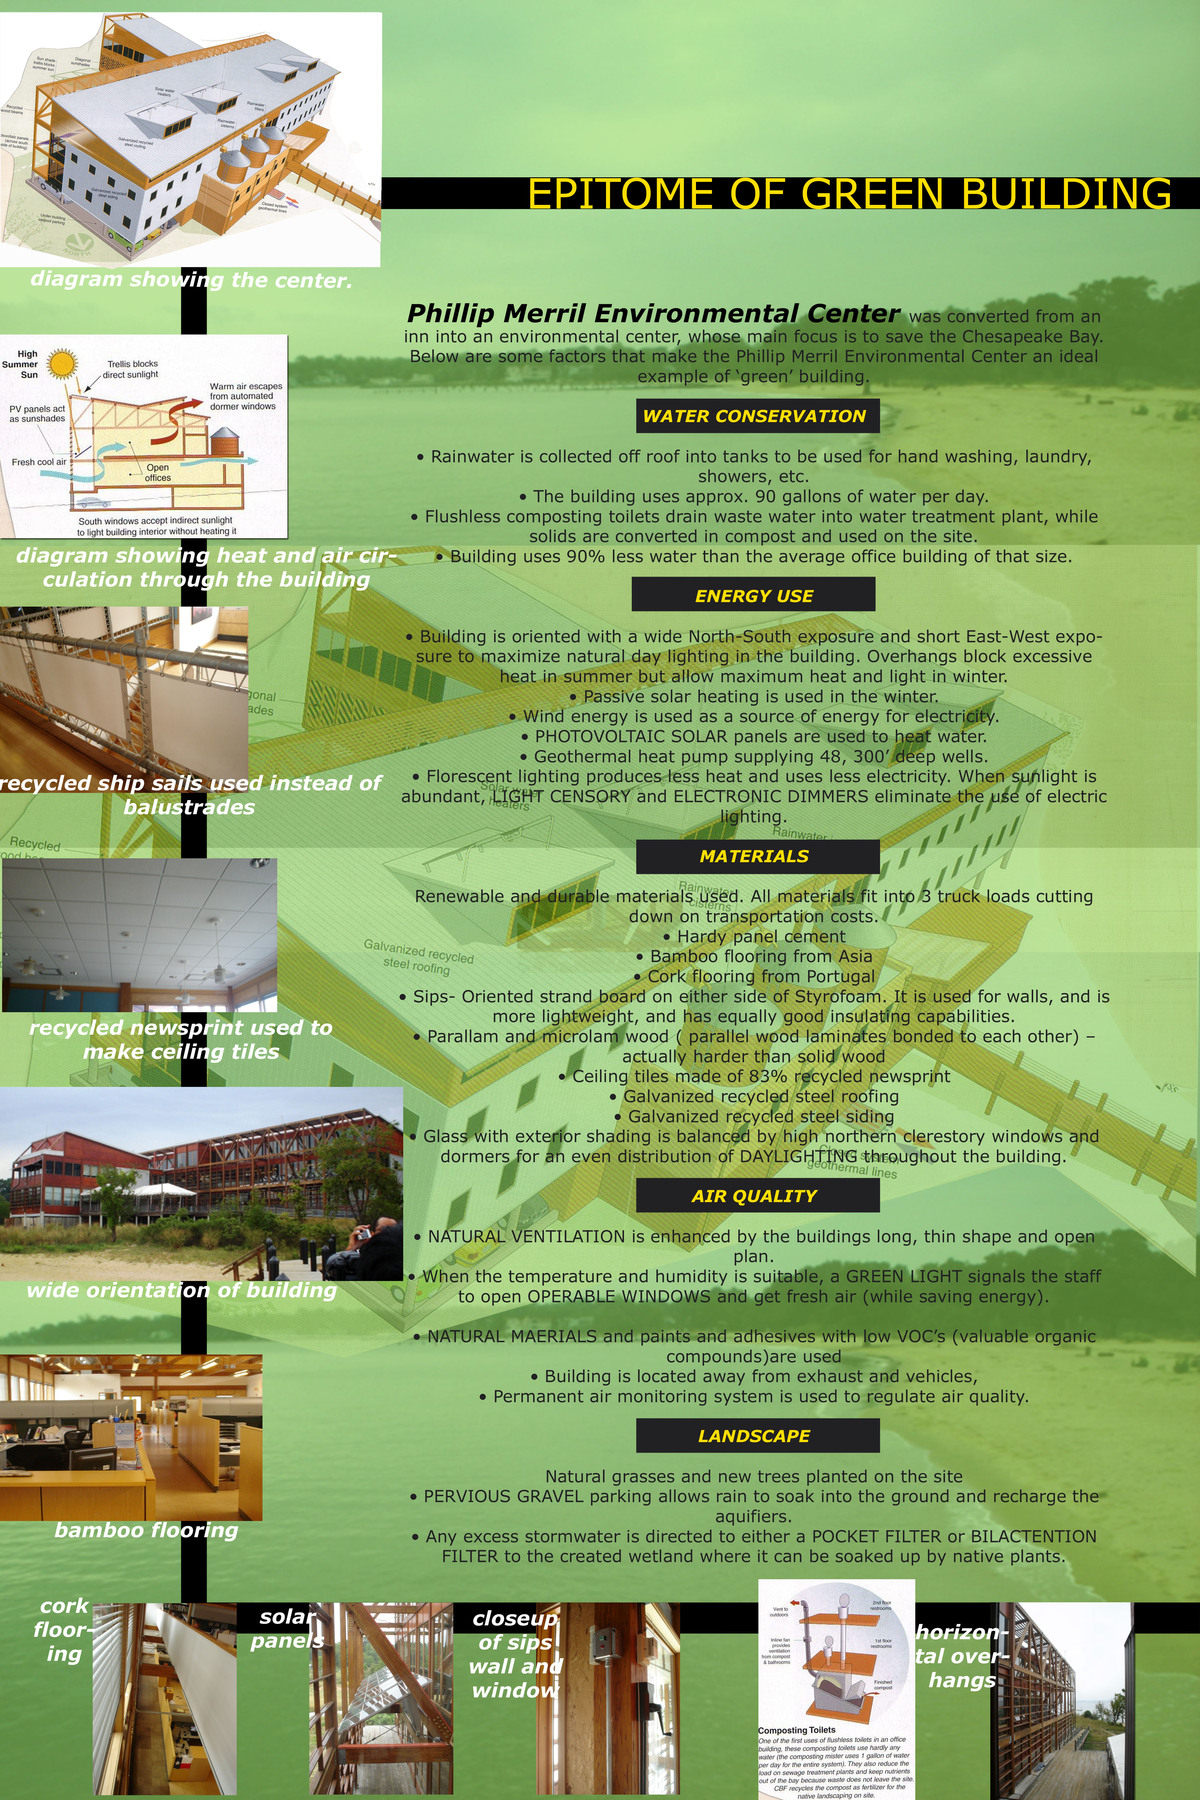 PHILLIP MERRIL ENVIRONMENTAL CENTER, environment systems